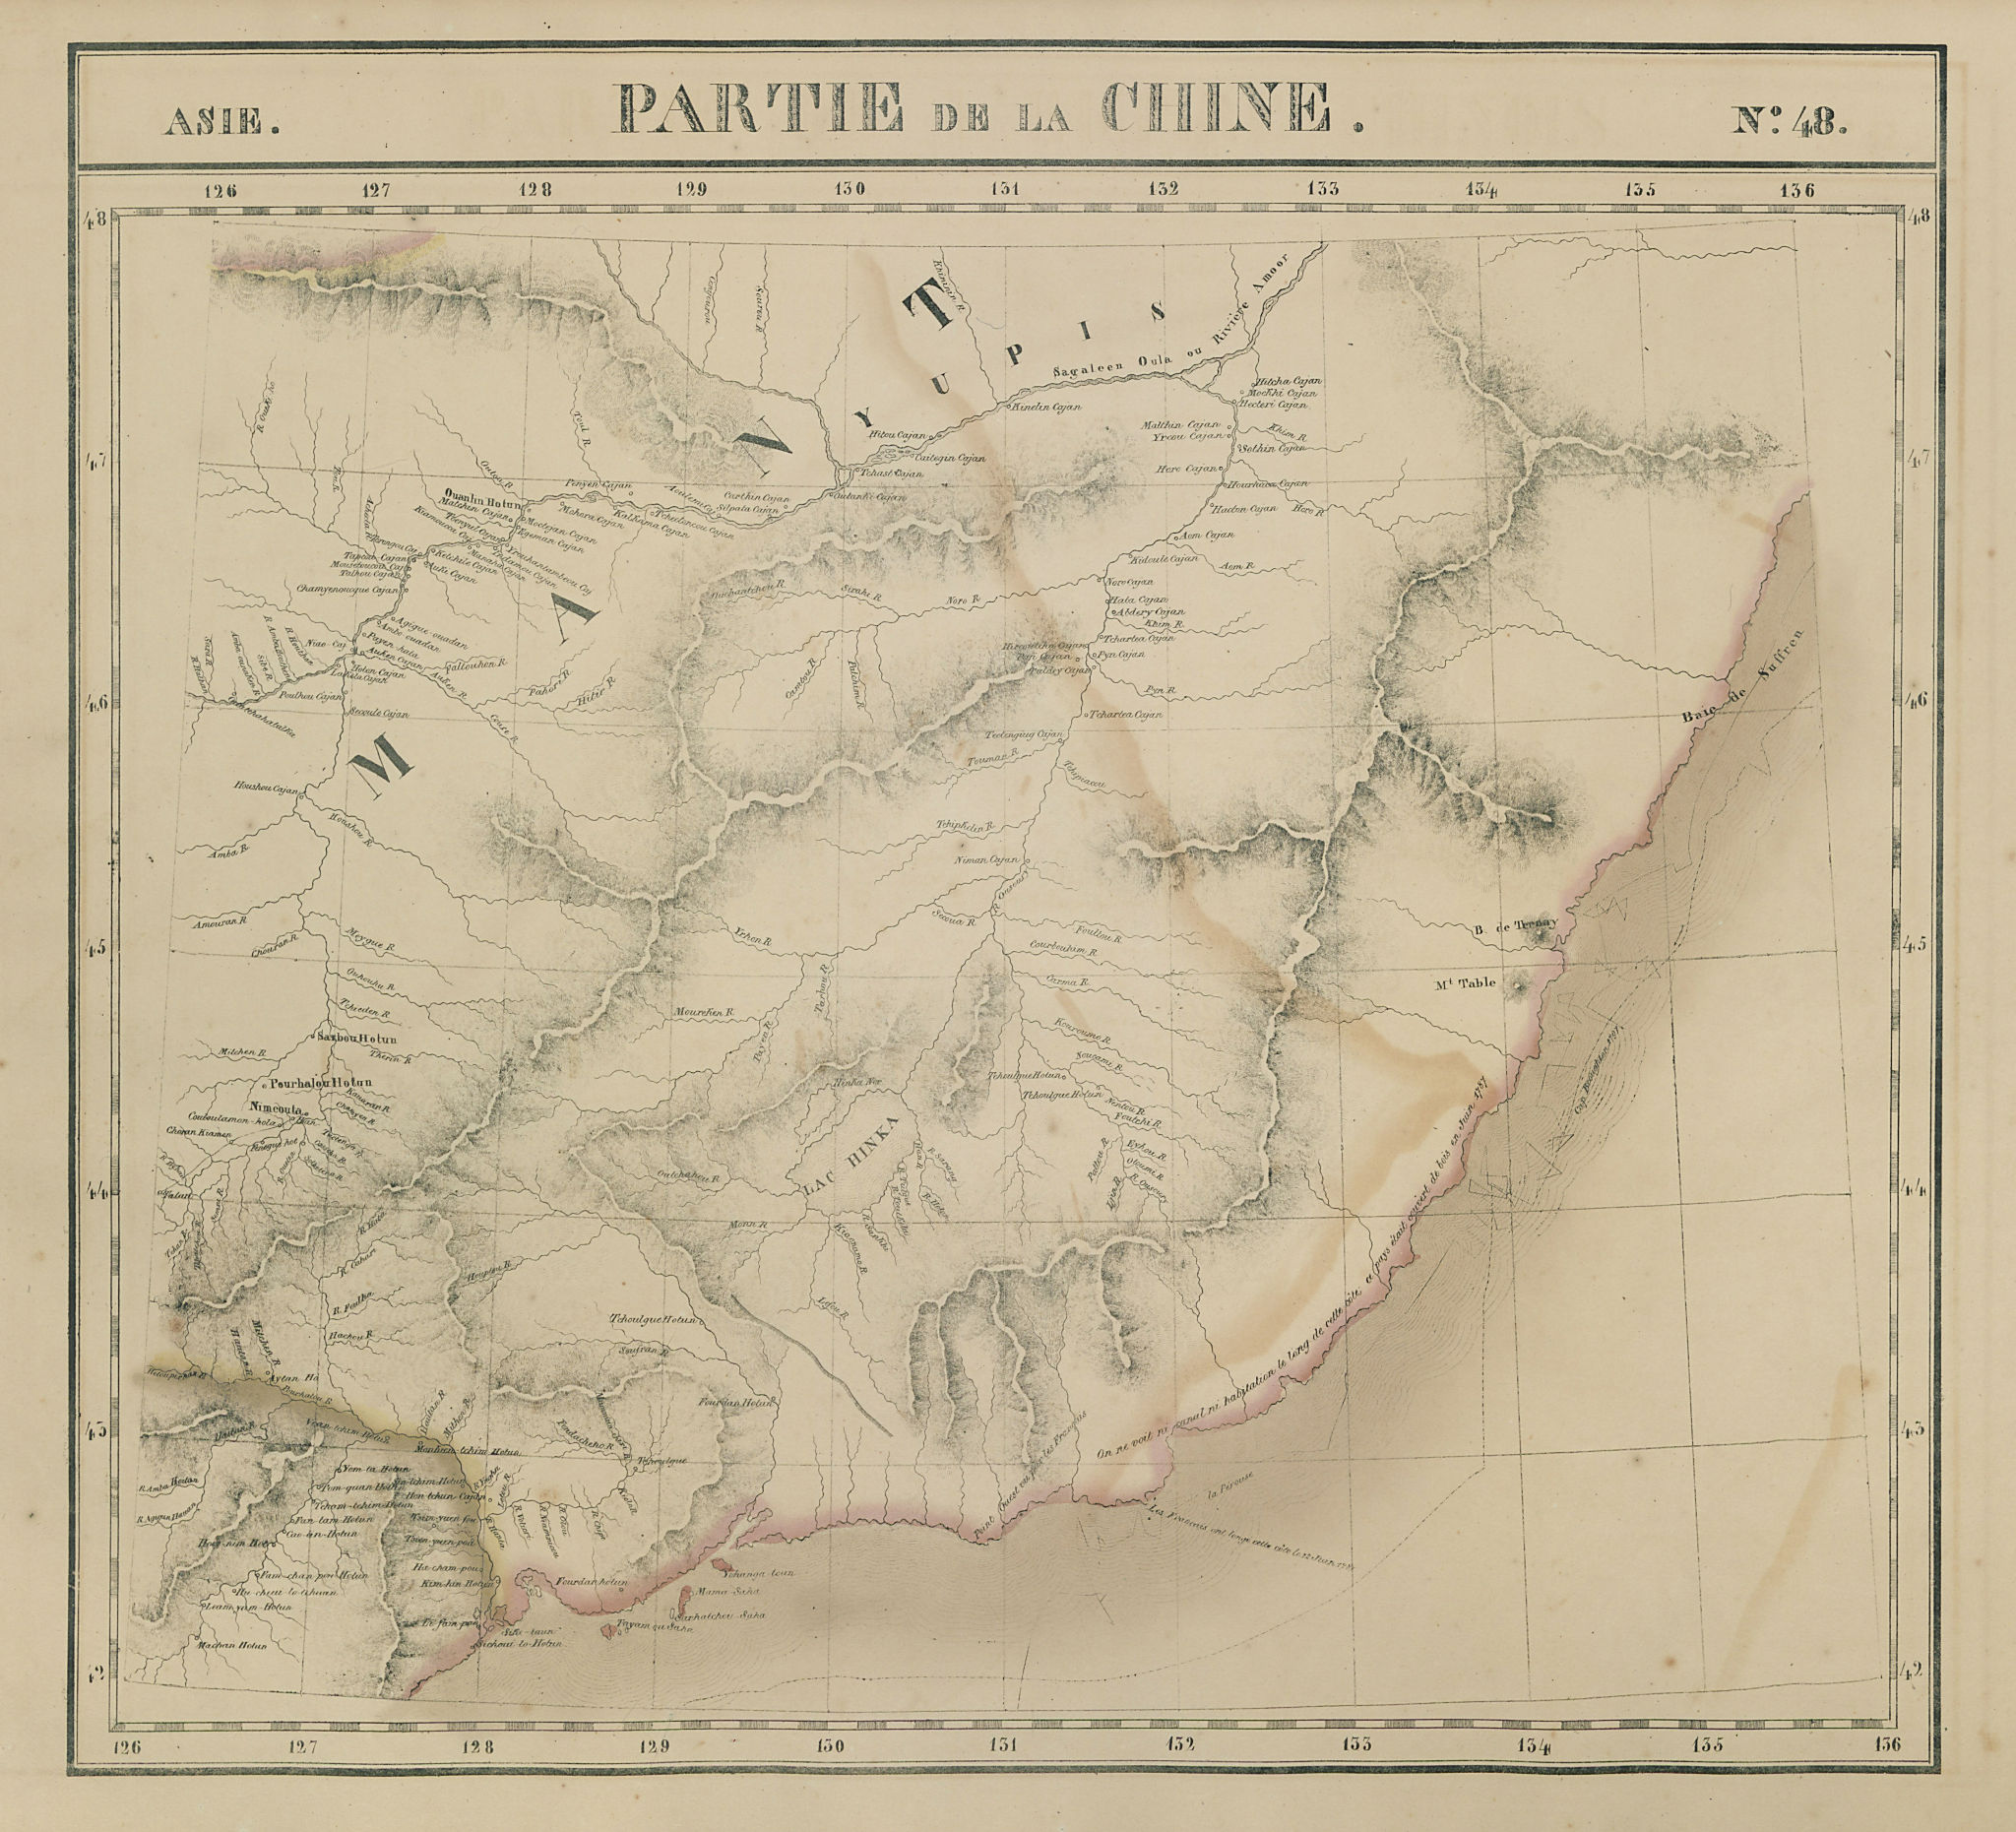 Asie. Chine #48 China Heilongjiang. Russia Primorsky Krai. VANDERMAELEN 1827 map